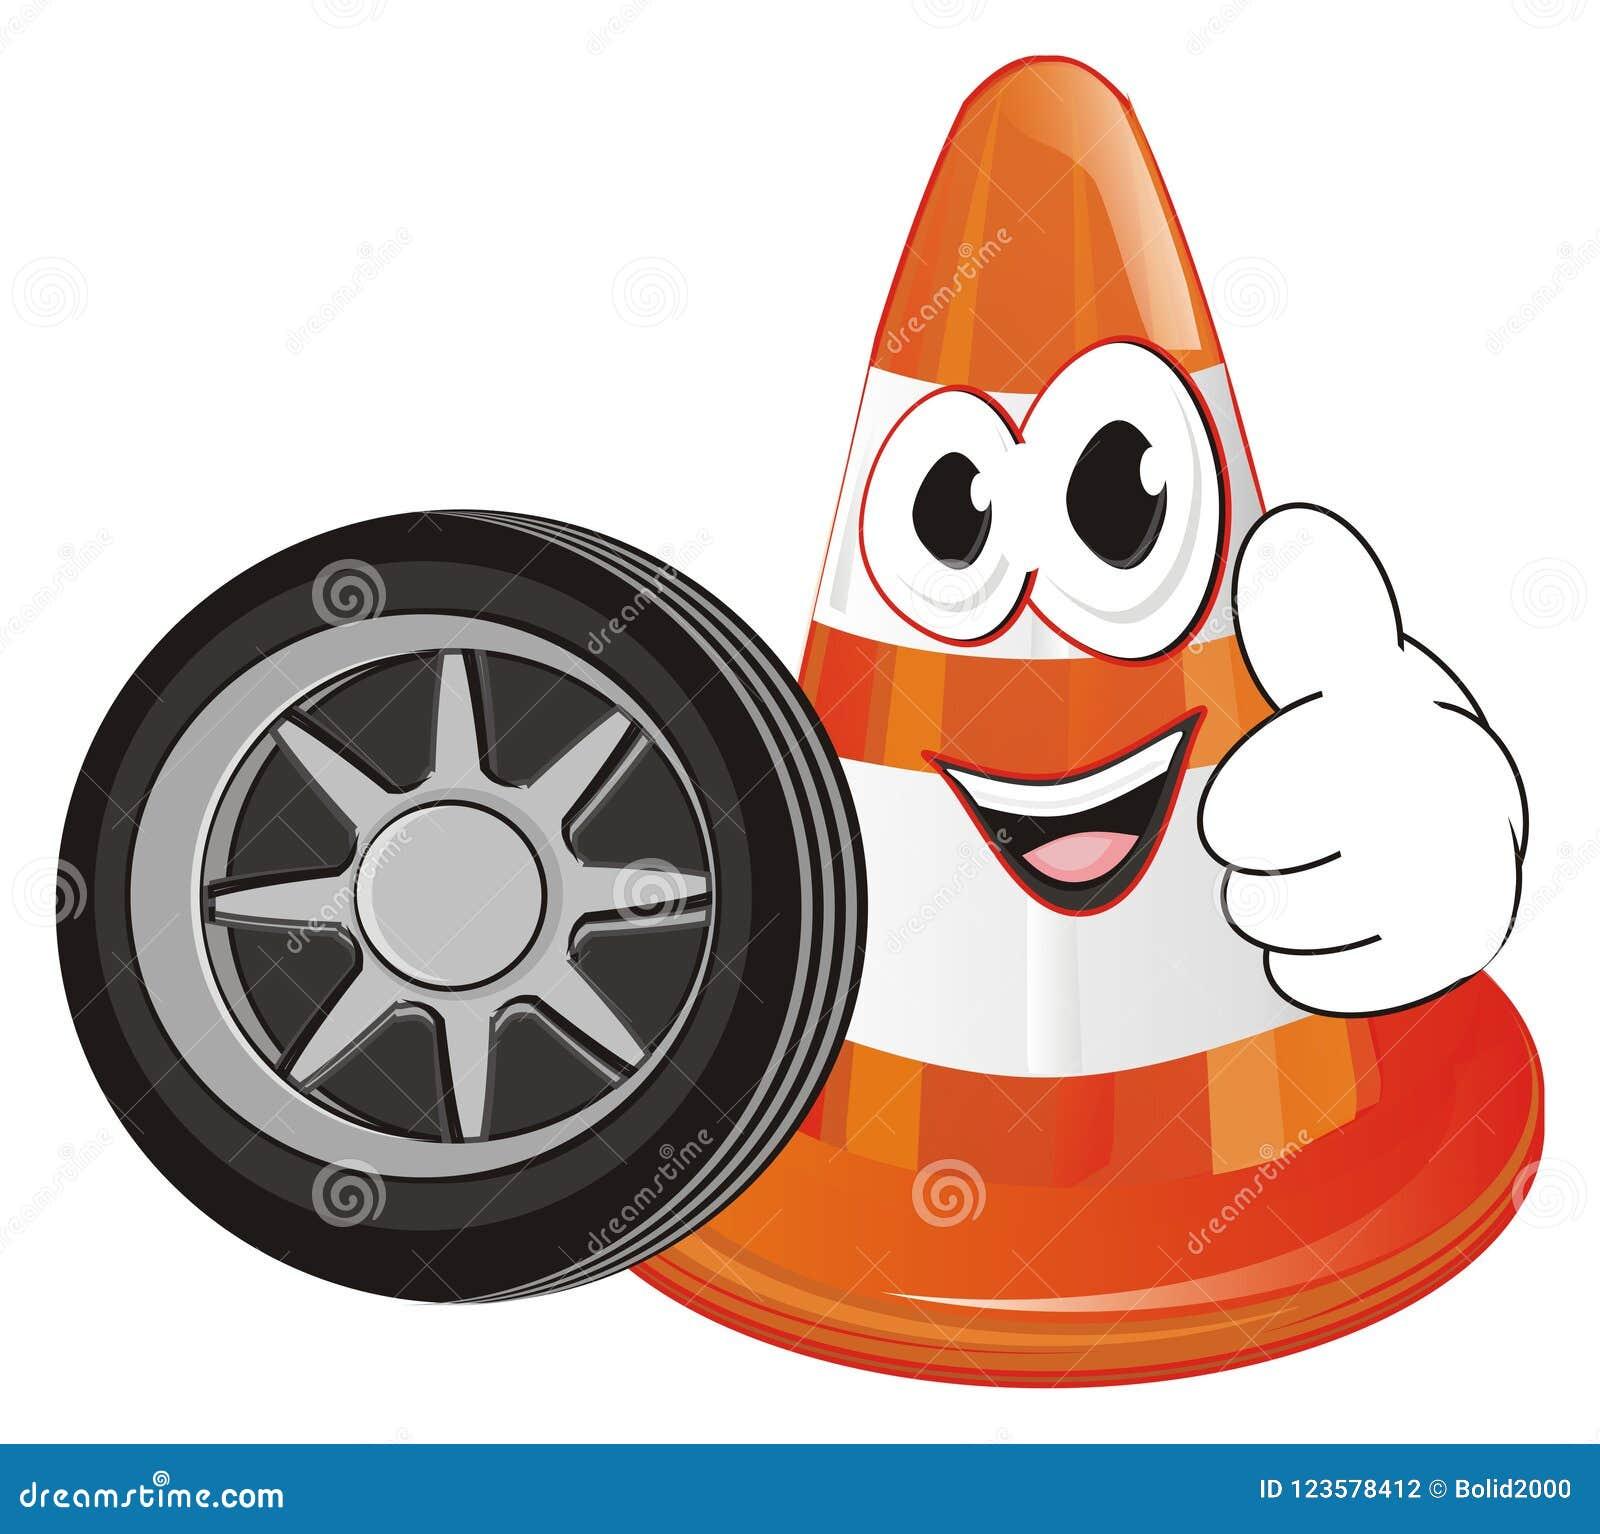 Happy Wheels Download Chip